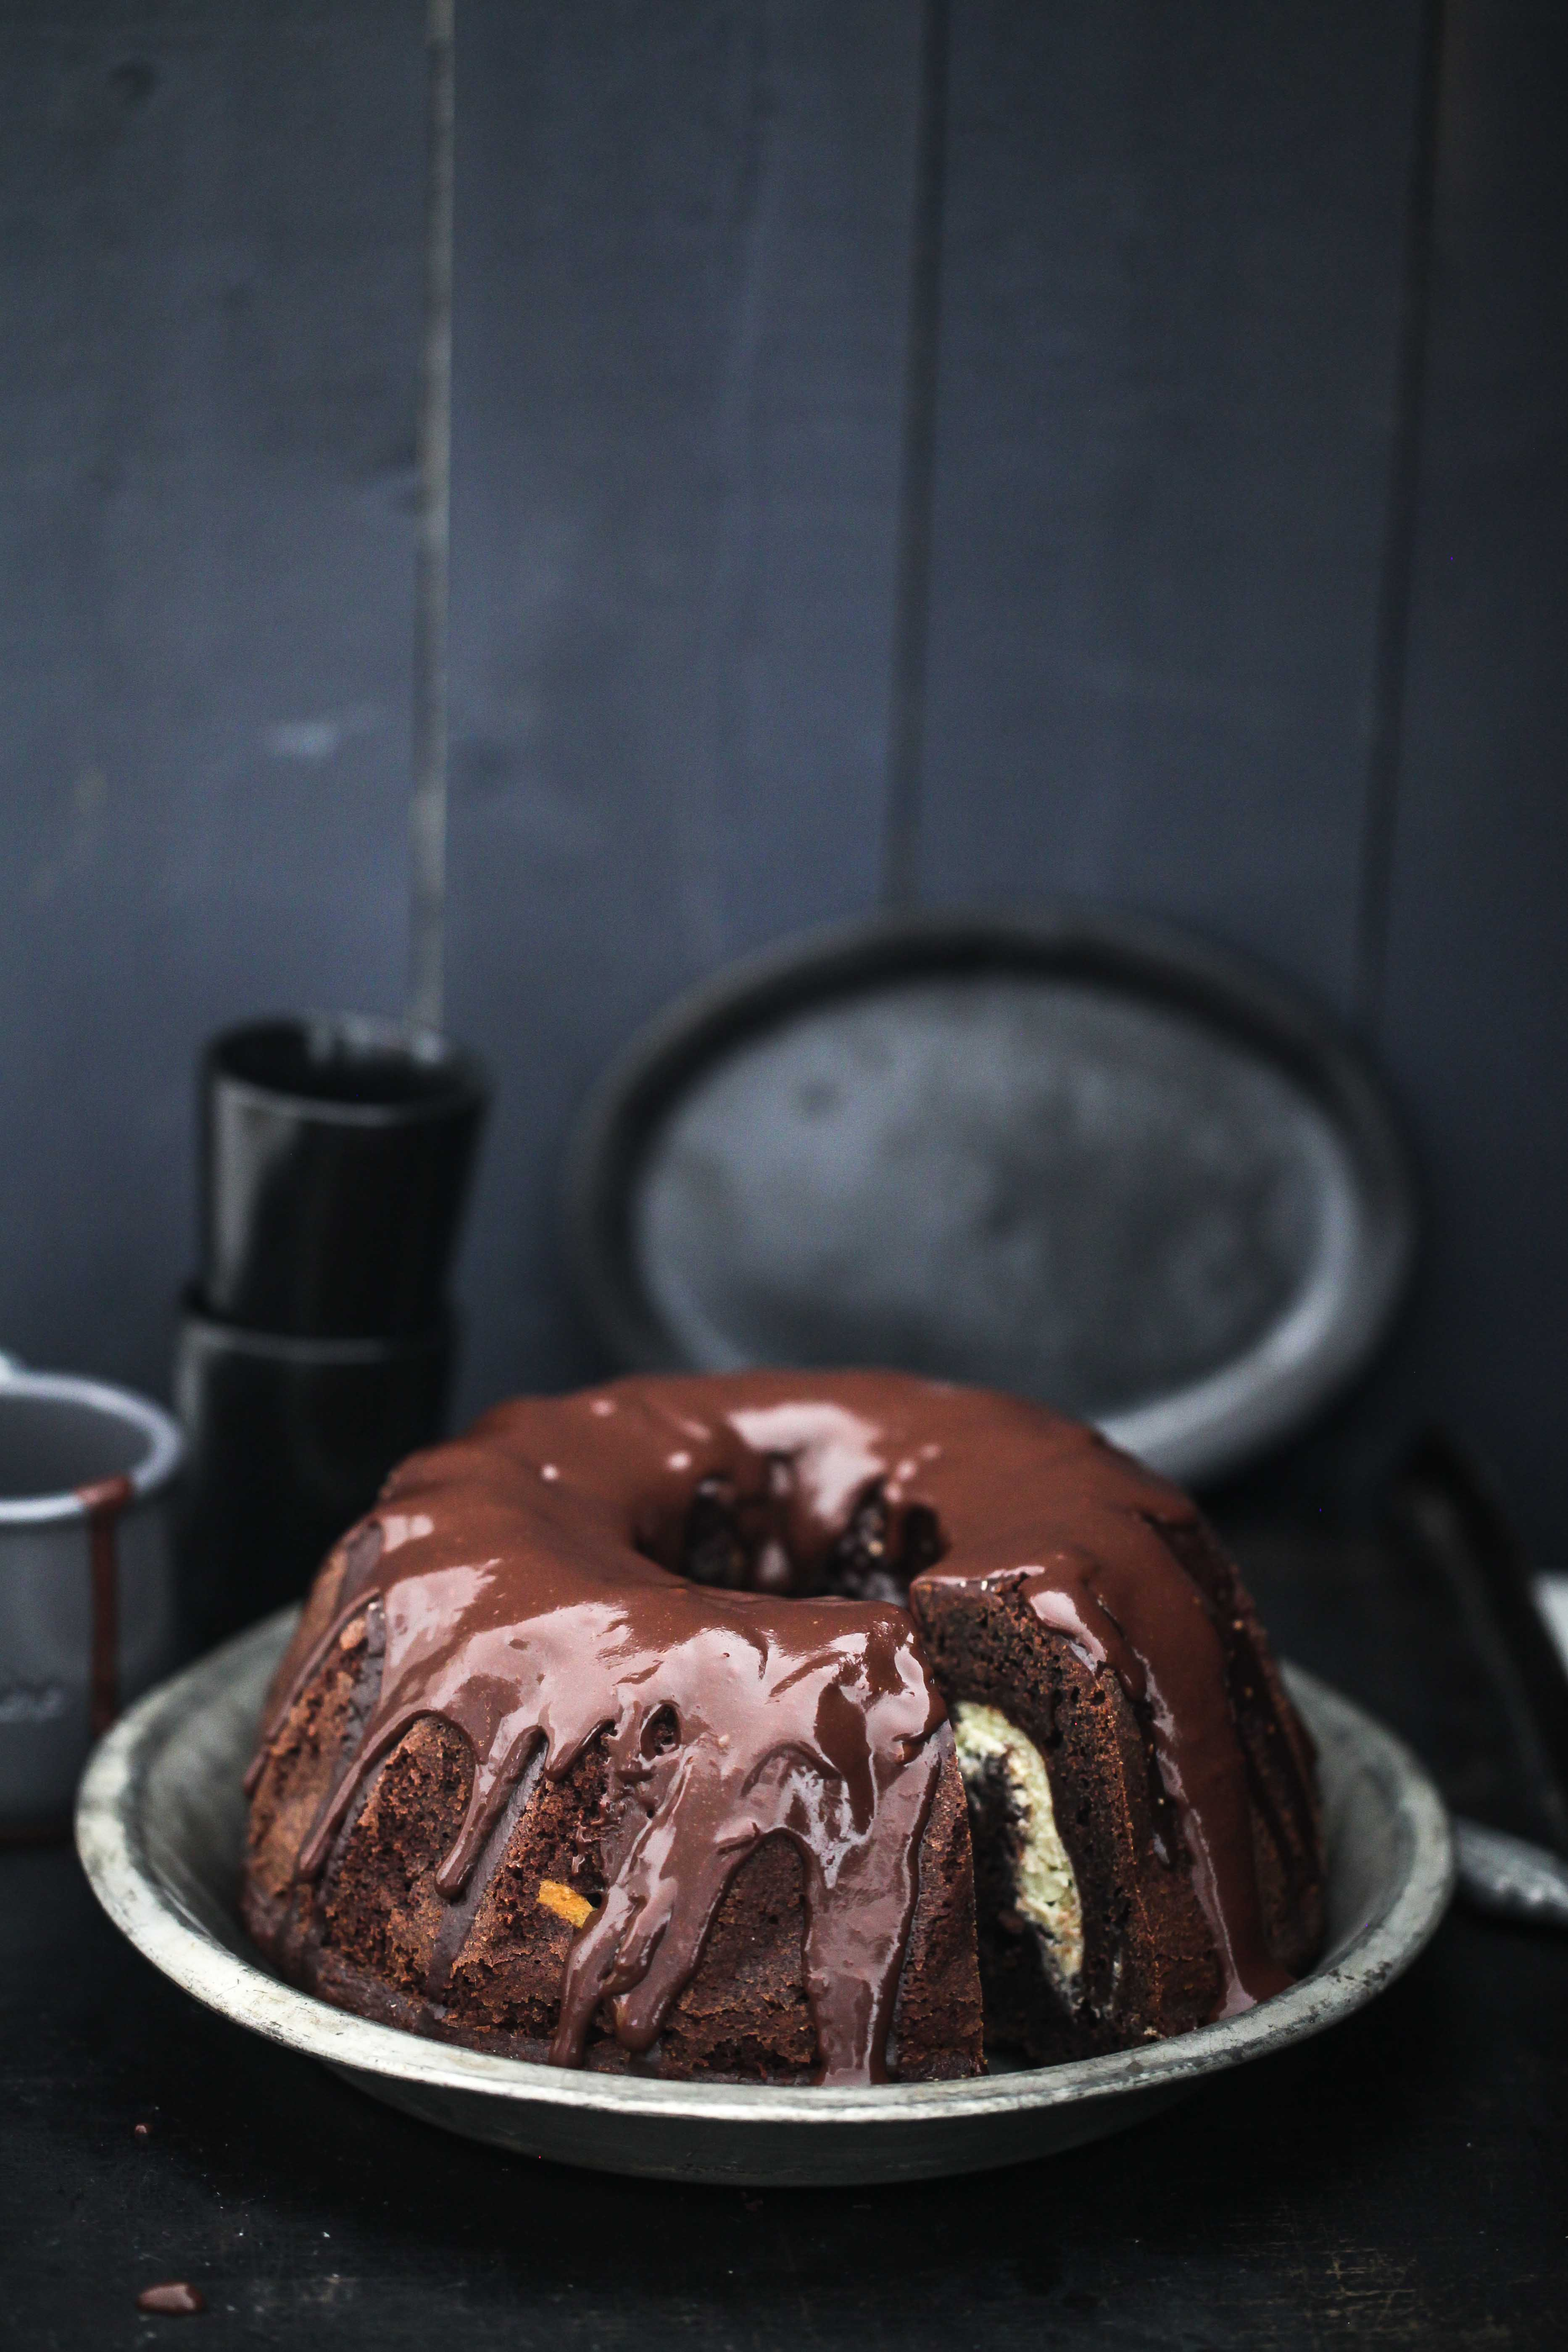 Rezept für Schokoladengugelhupf mit Cheesecakefüllung Kakaokuchen Schokoladenkuchen Käsekuchen Füllung Backrezept Zuckerzimtundliebe Foodblog Backblog Brownie